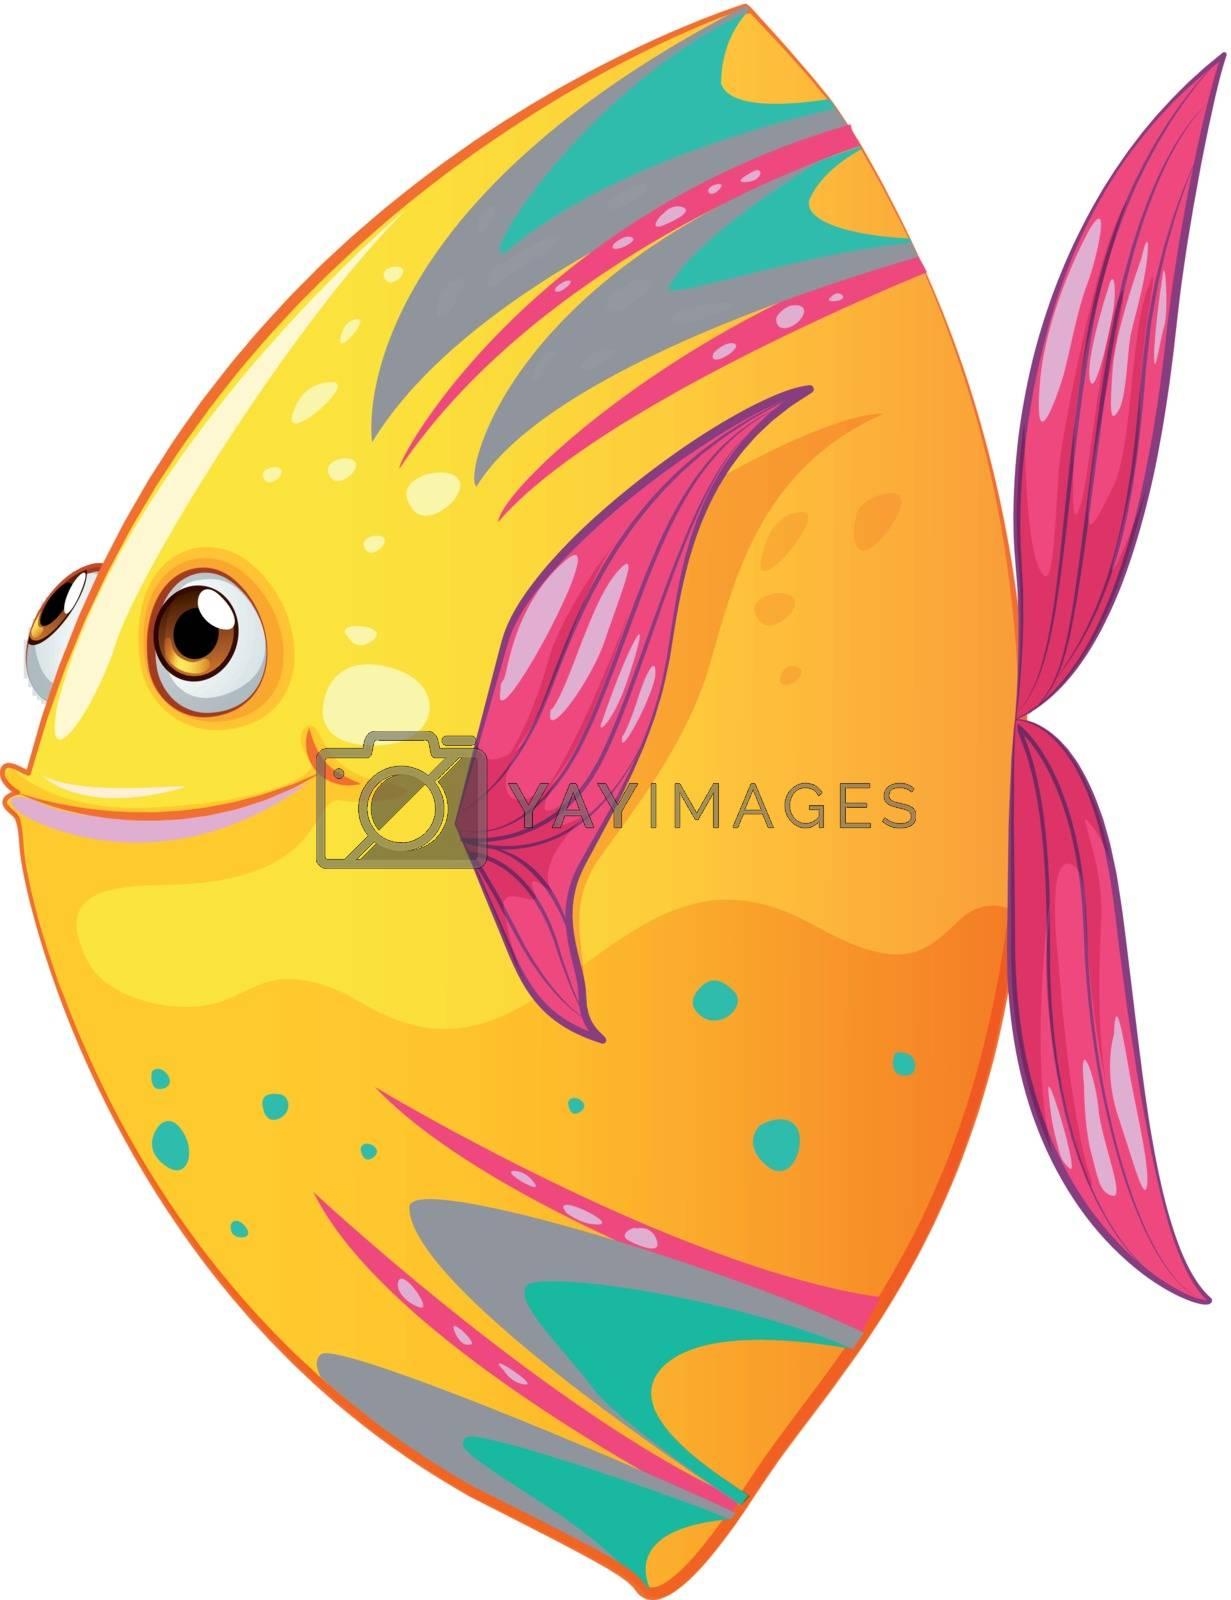 Illustration of a big colorful fish